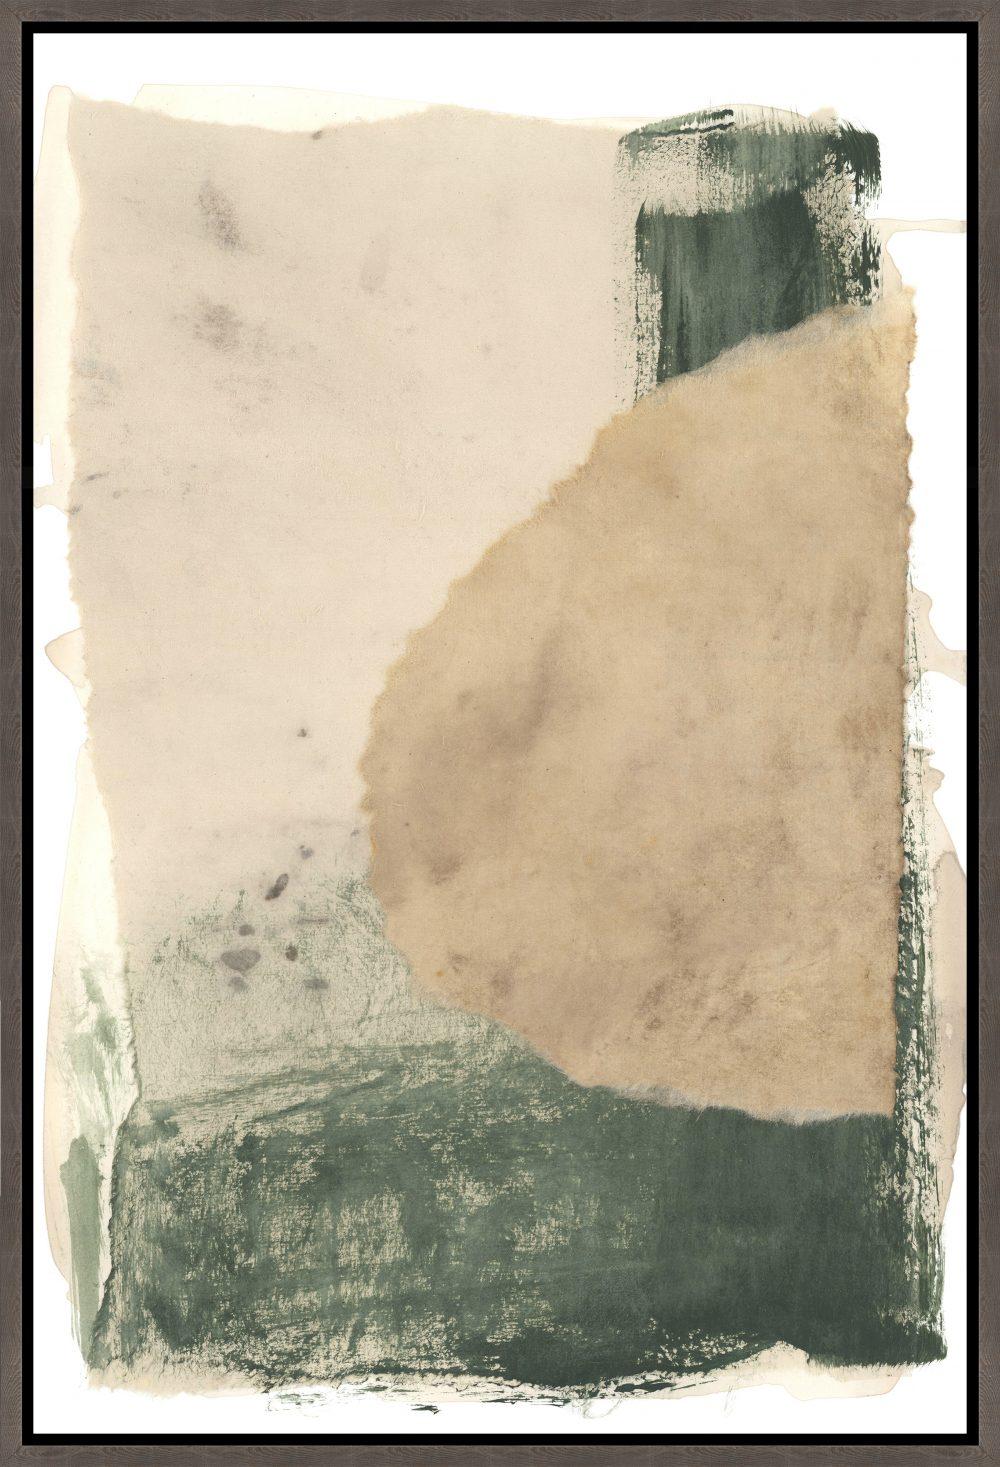 Macchiato IV by Jean Kenna